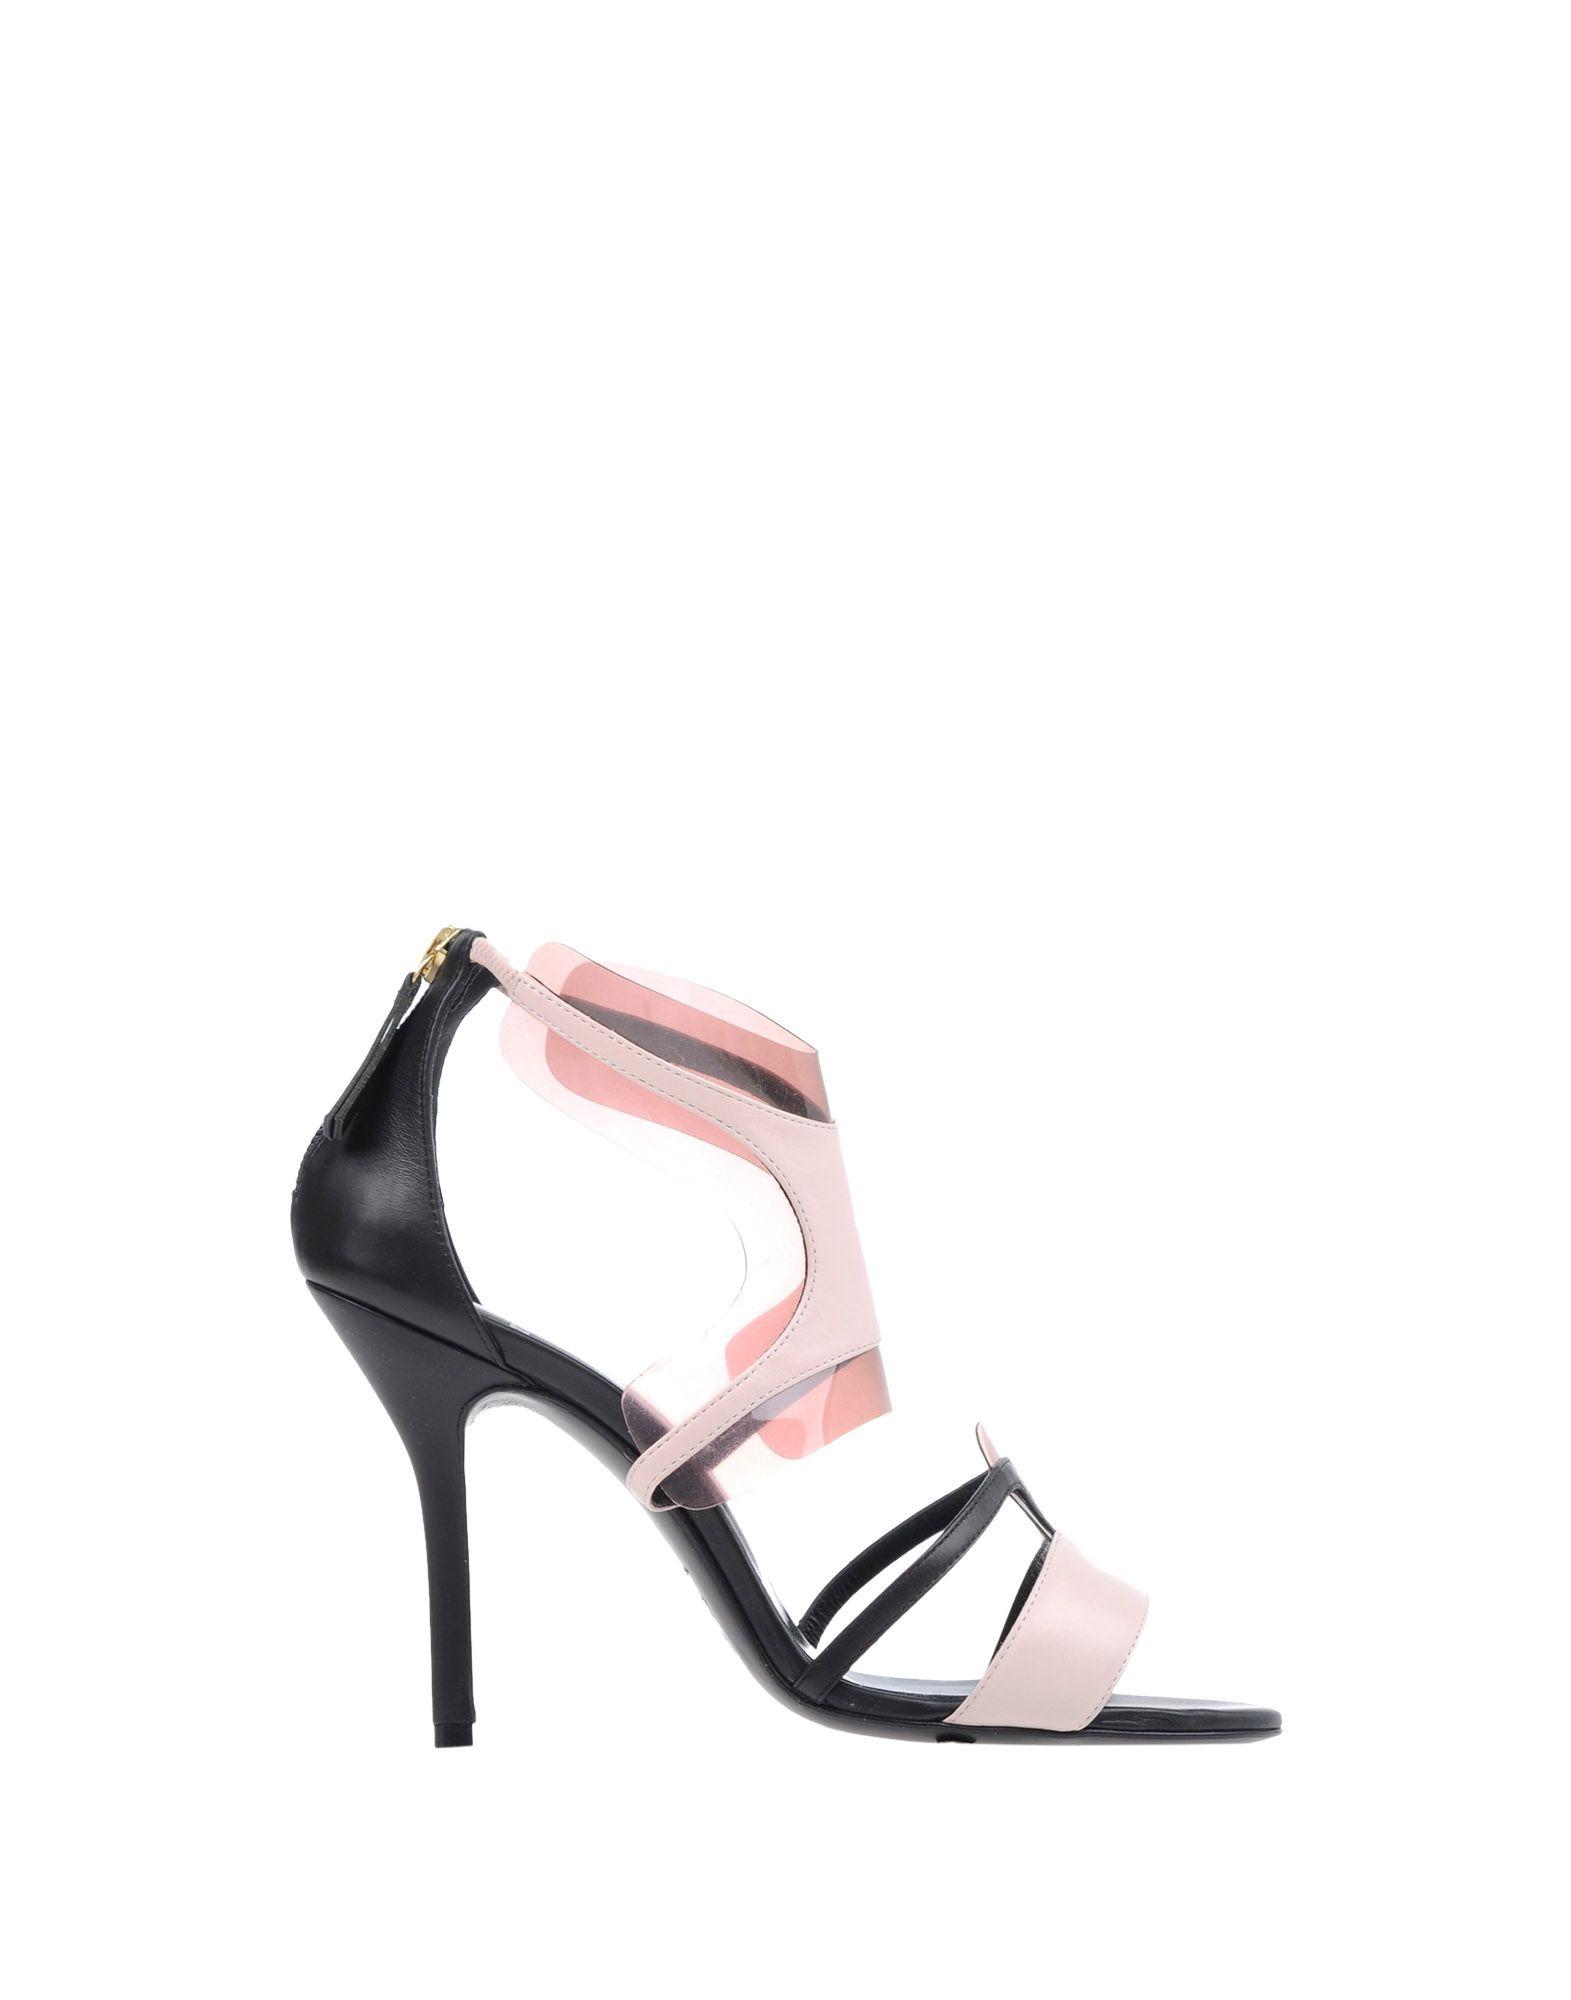 Gut Gut Gut um billige Schuhe zu tragenPierre Hardy Sandalen Damen  11332021LK 335cdd